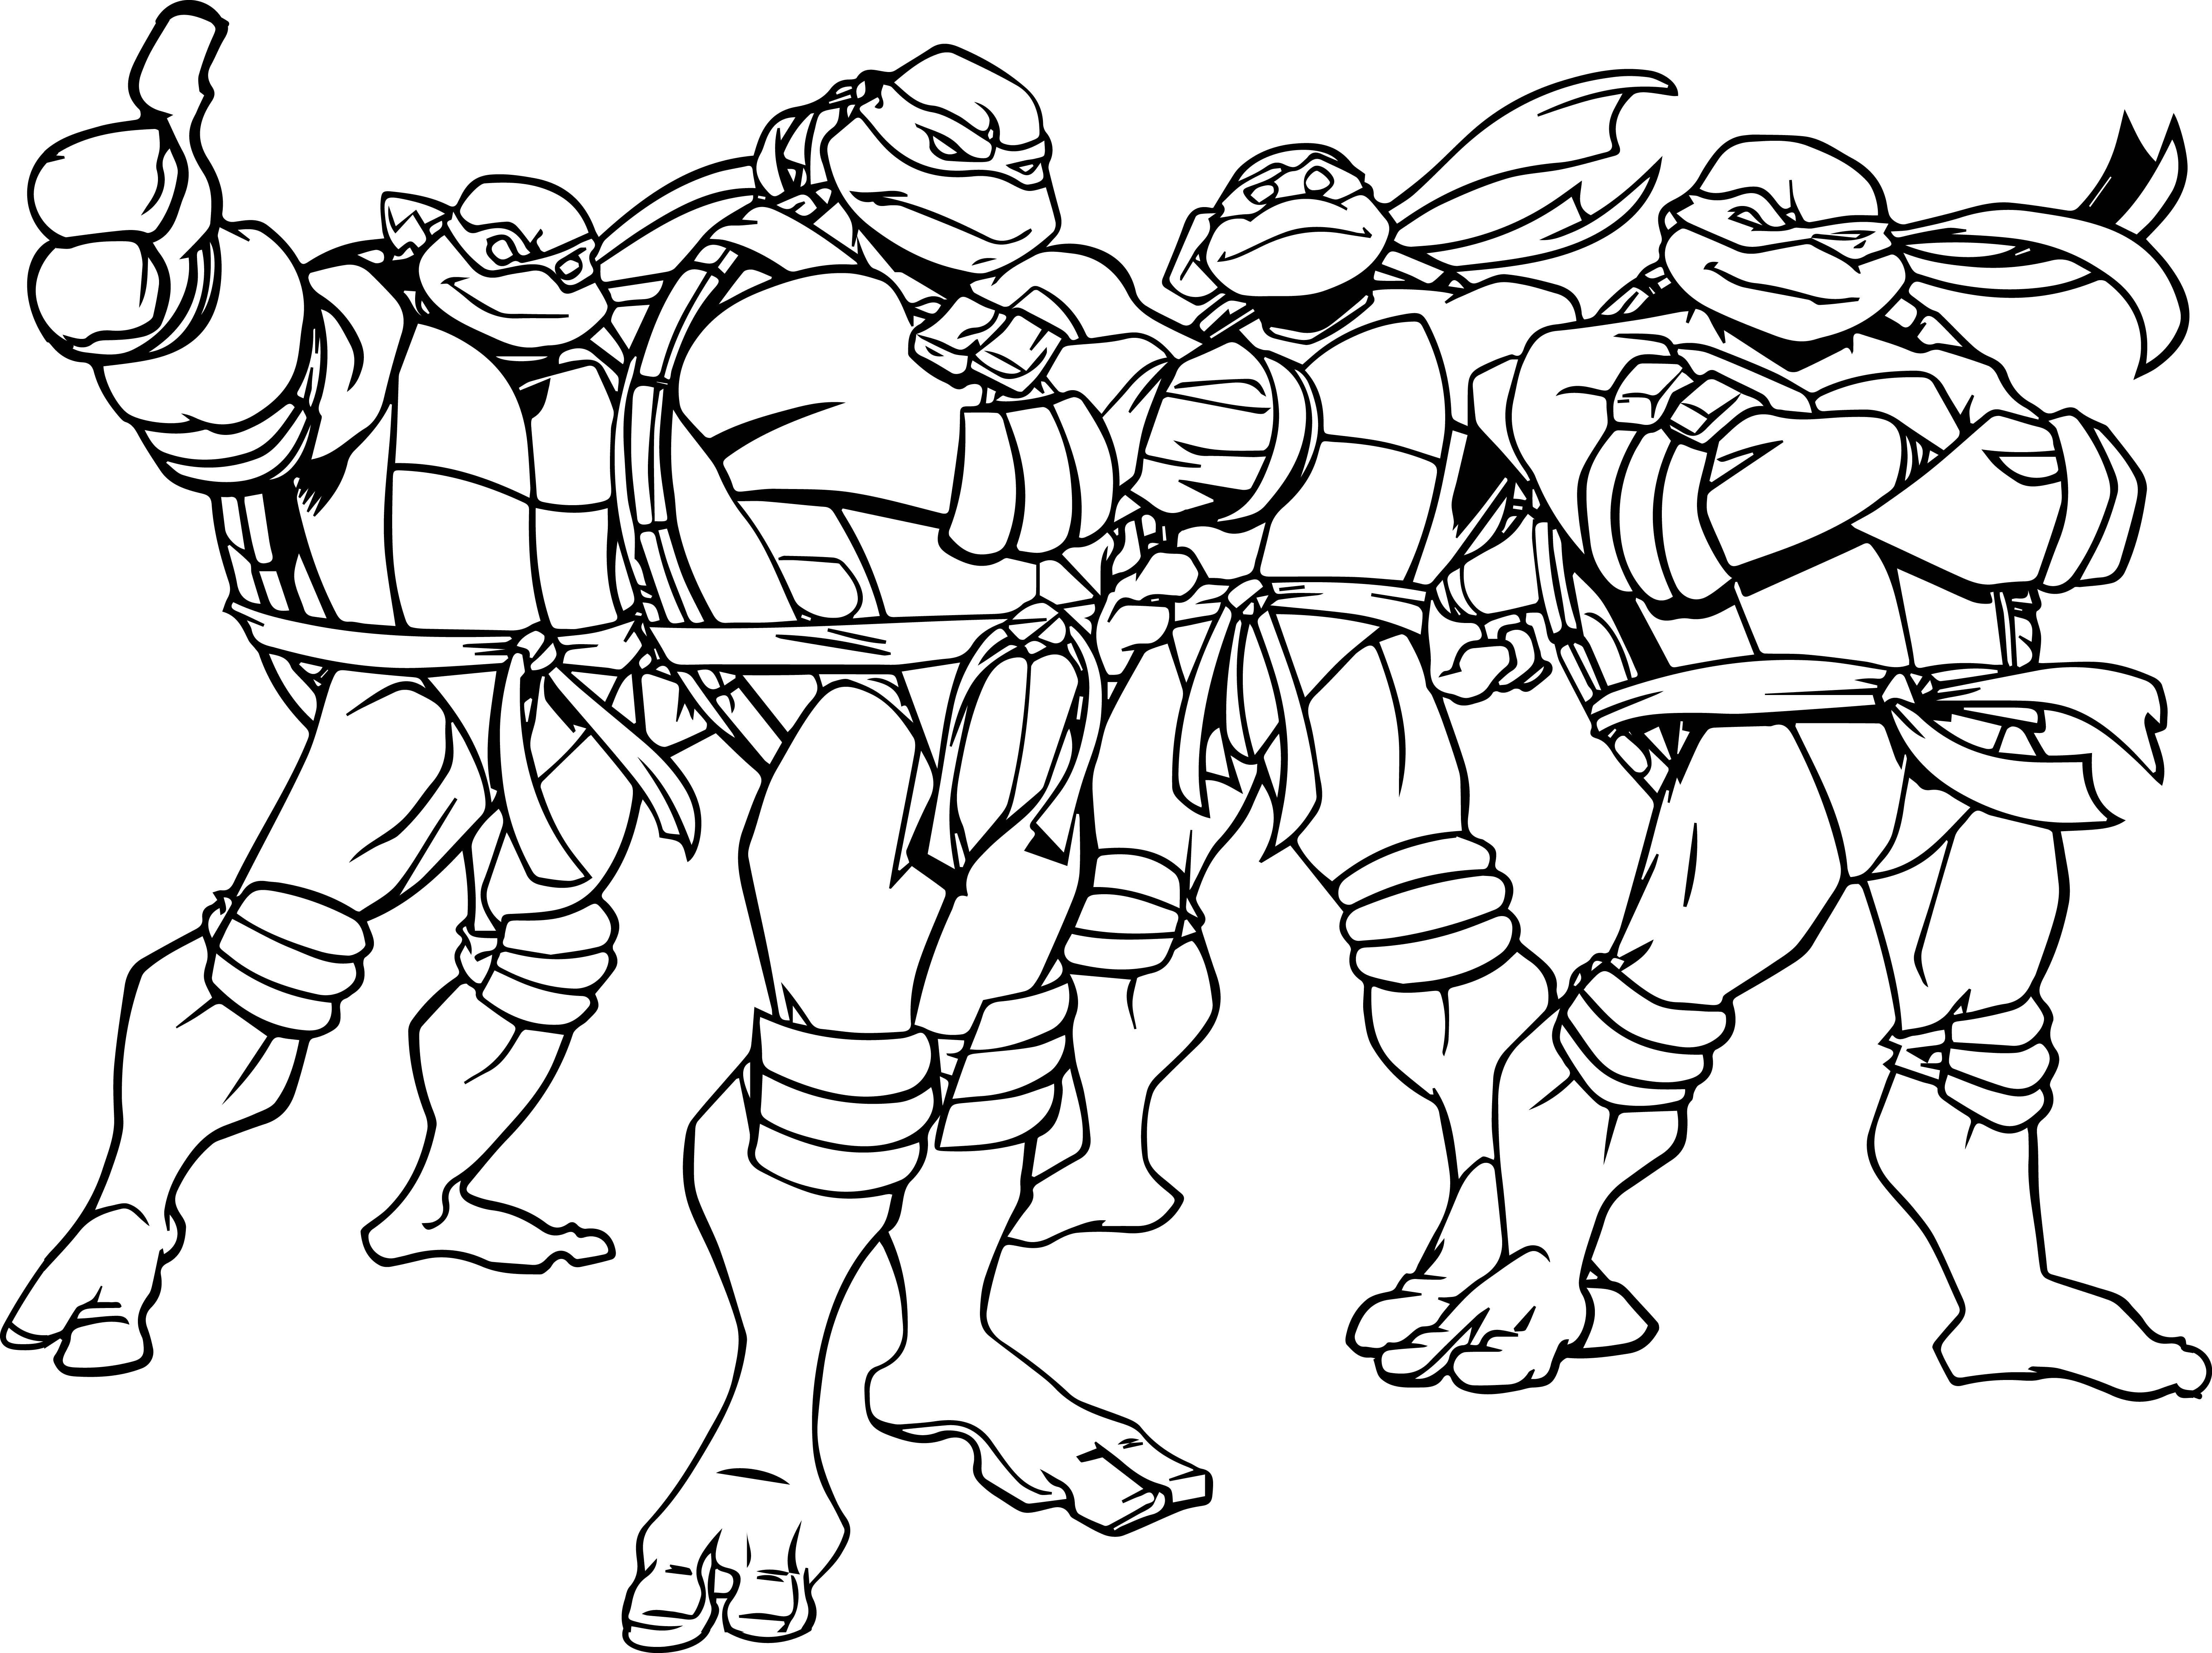 Launching Ninja Turtles Coloring Sheets Teenage Mutant Pages Book